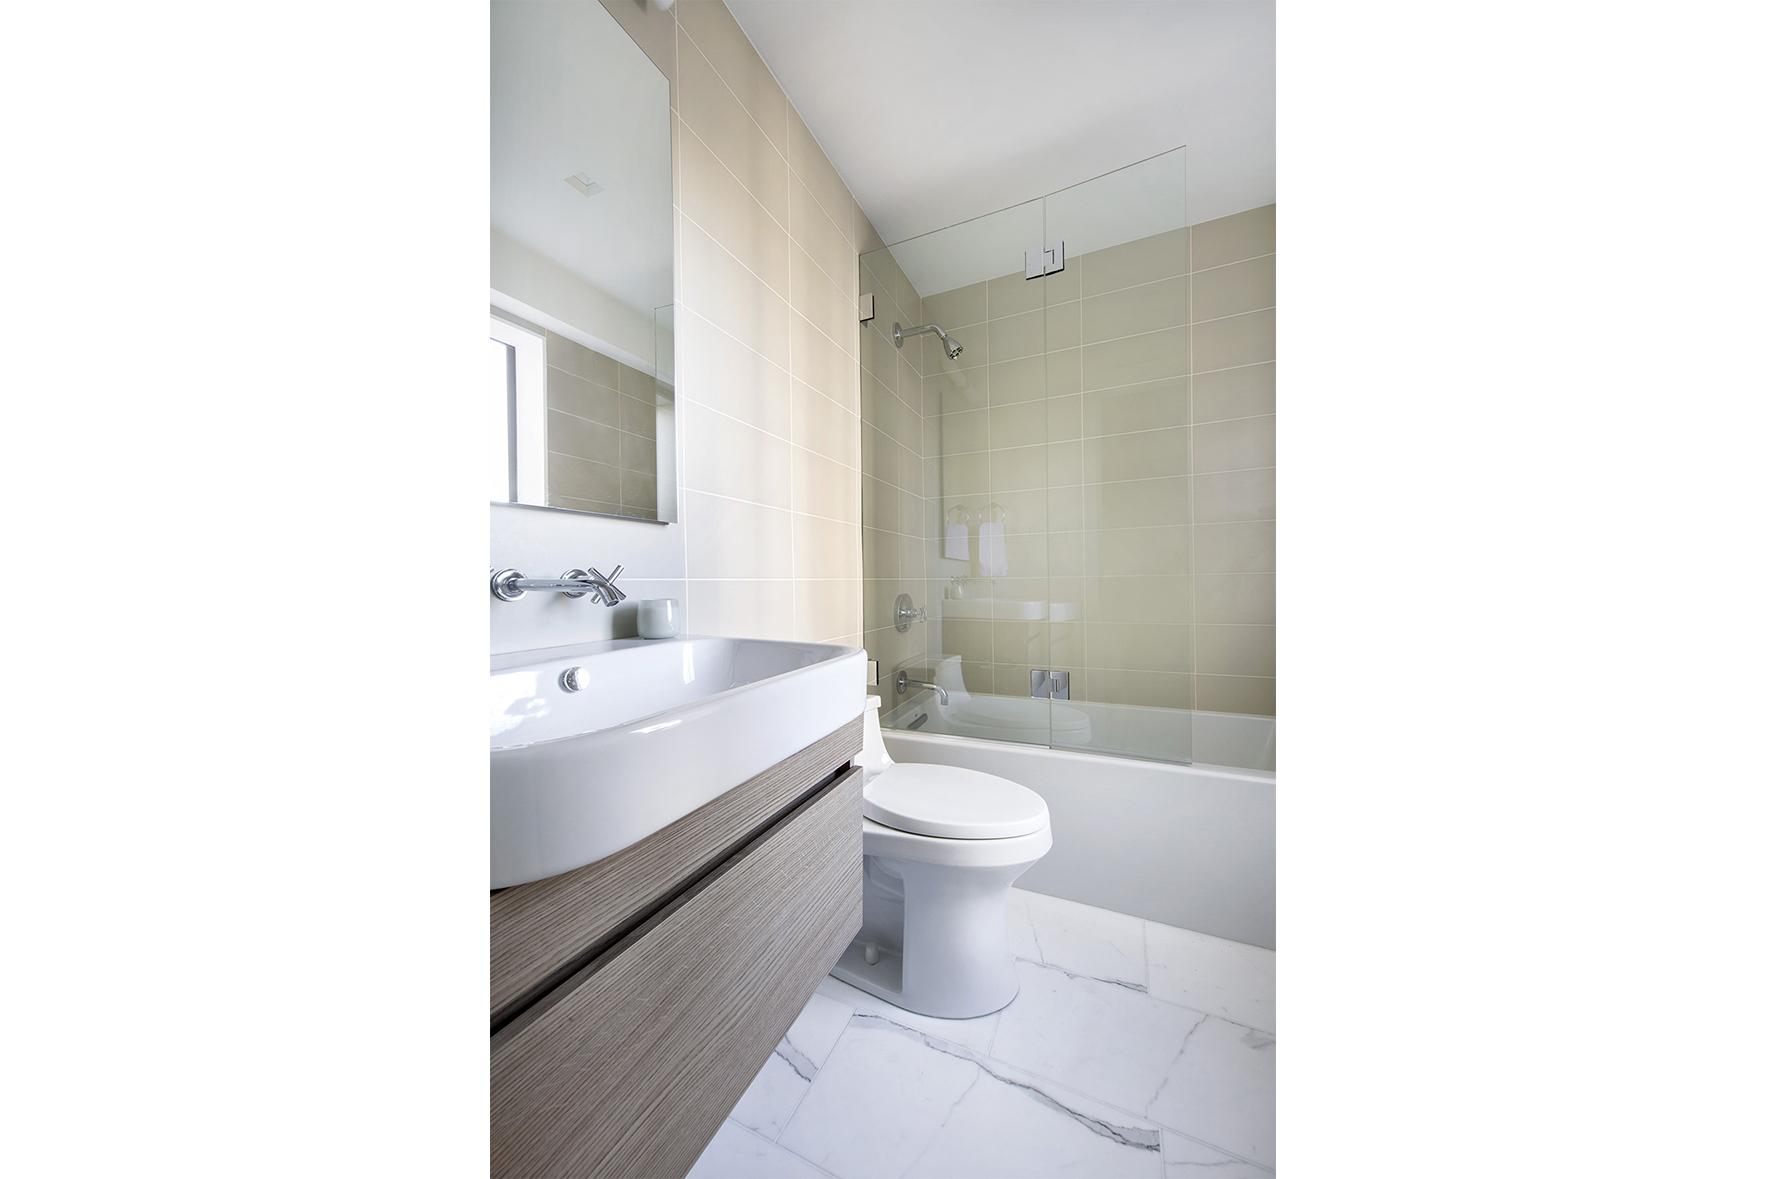 900ParkAve8E - Second Bathroom.jpg